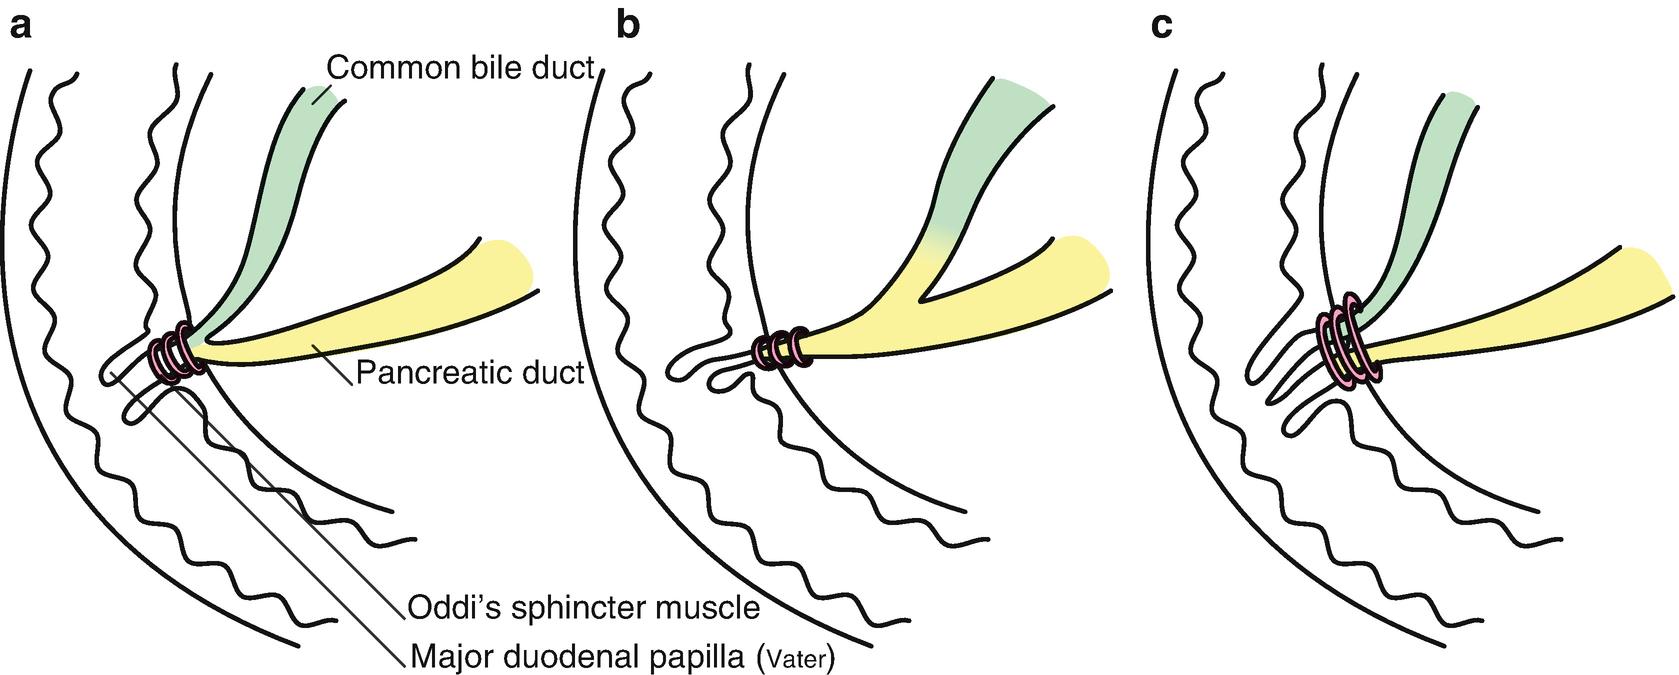 Modern Pancreatic Divisum Anatomy Pattern - Human Anatomy Images ...